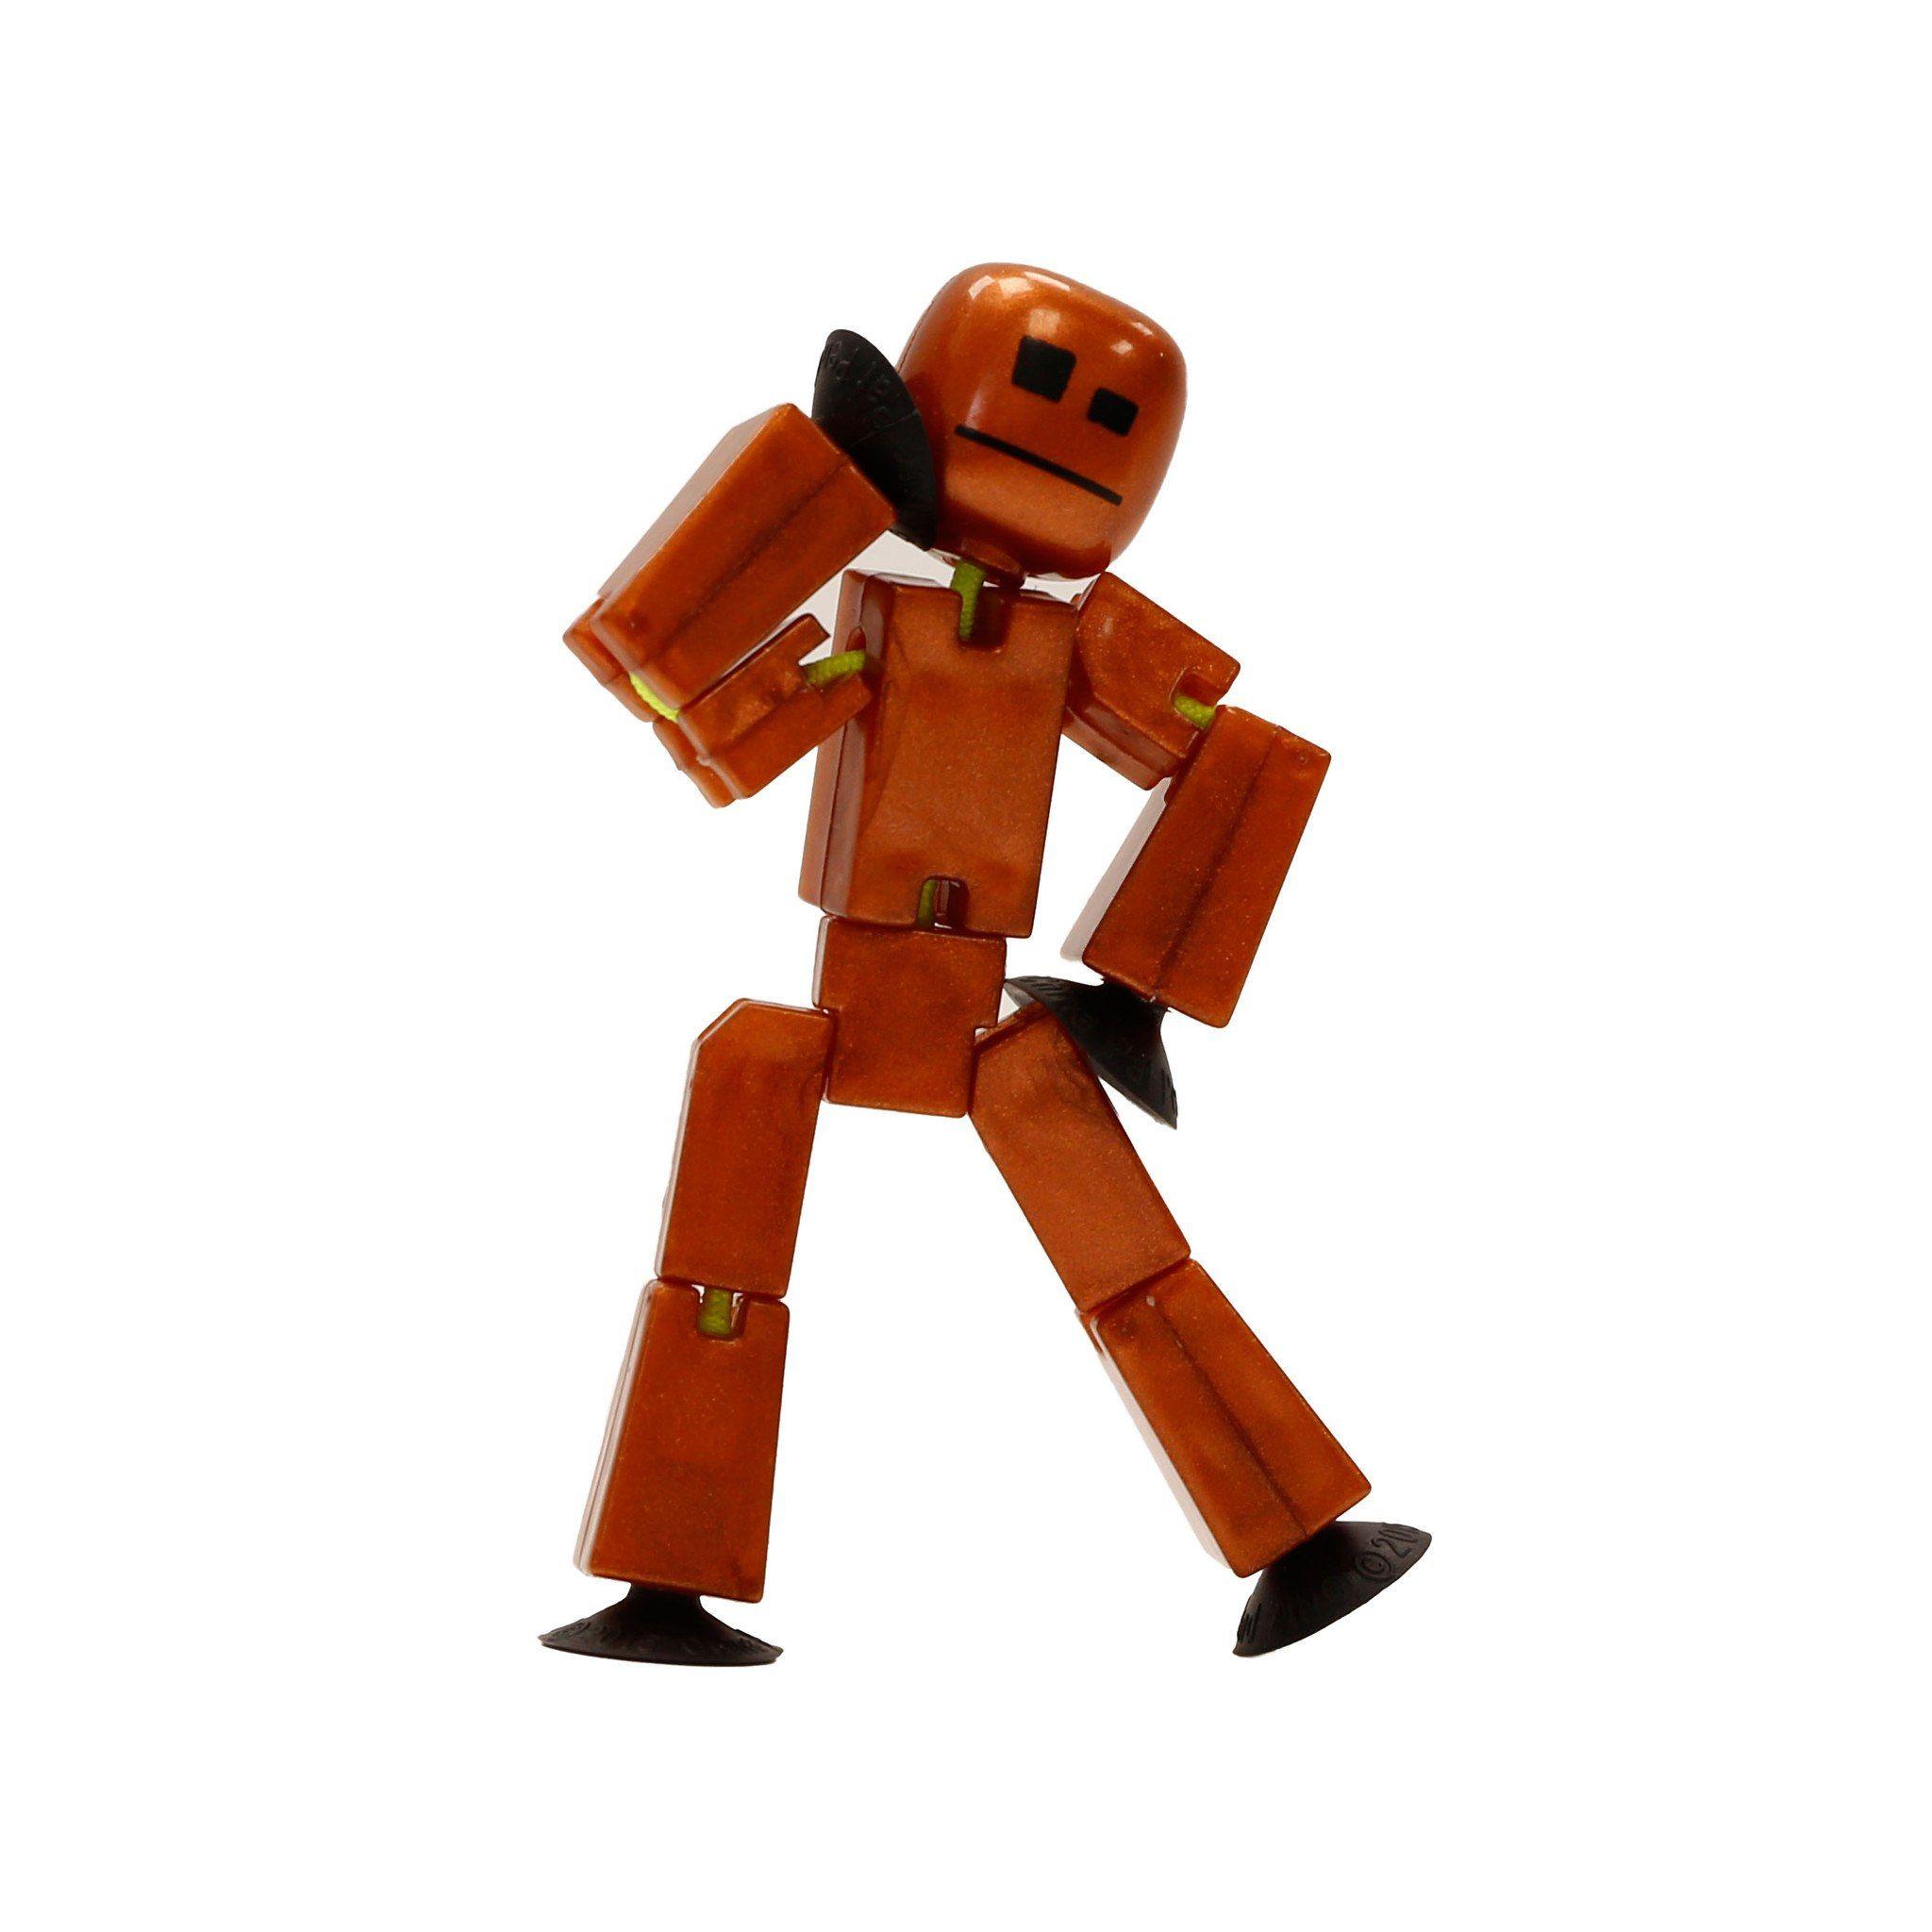 Stikbot Metalbots Stikbot Turns Kids Into Creative